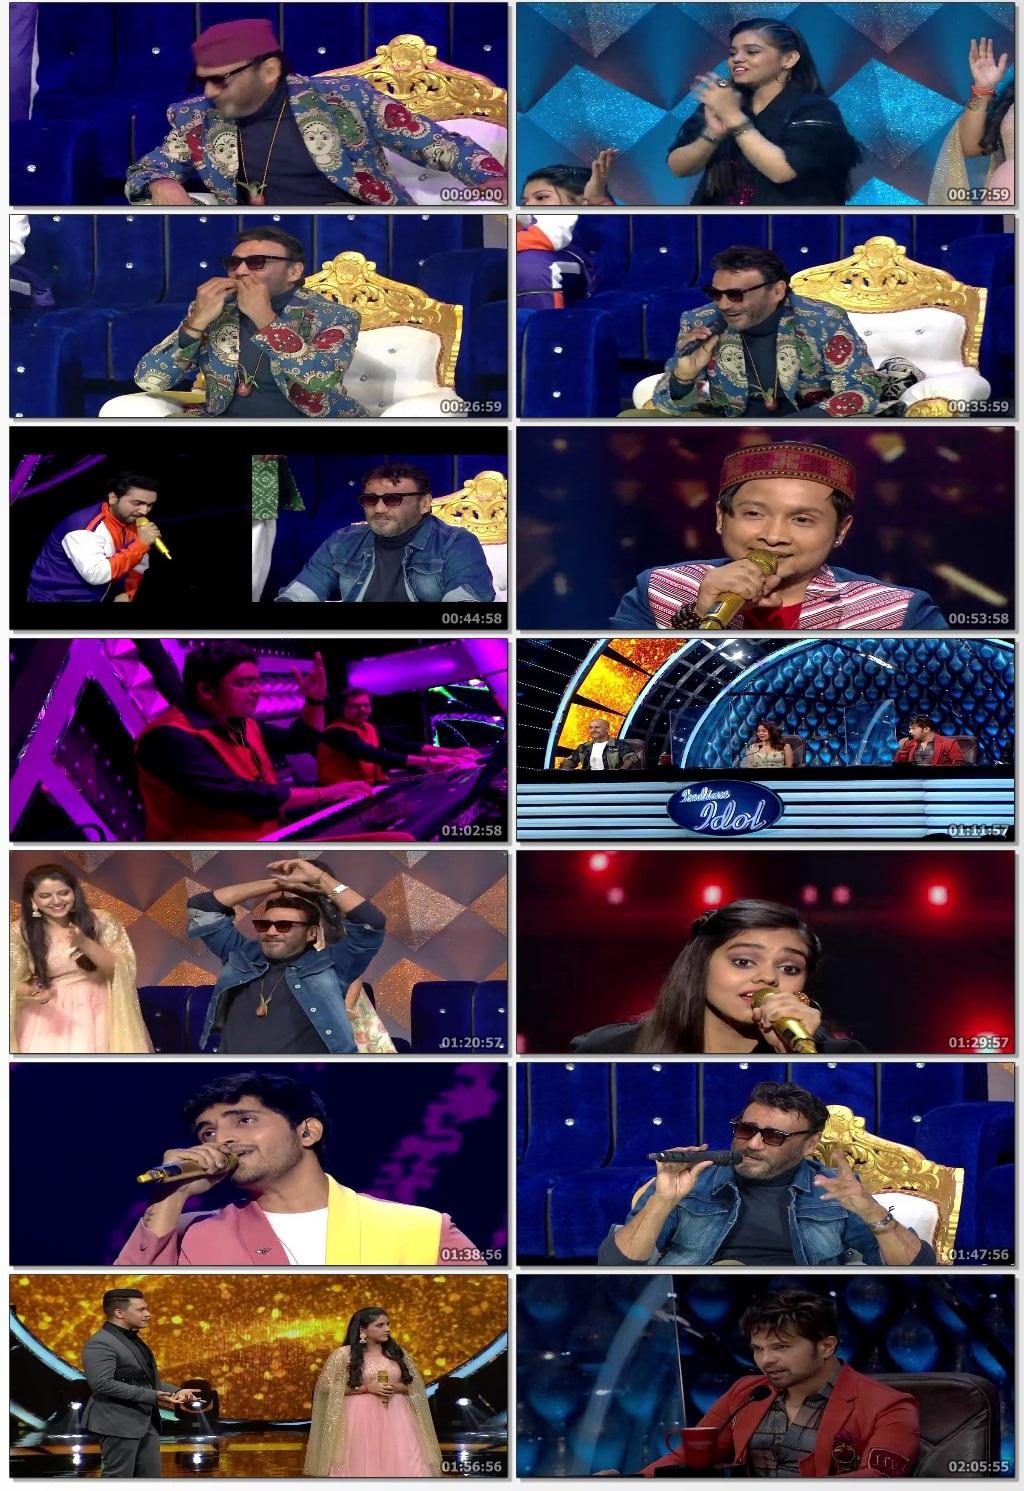 Indian-Idol-S12-14th-March-2021-www-9kmovies-cool-Hindi-Full-Show-720p-HDRip-900-MB-mkv-thumbs